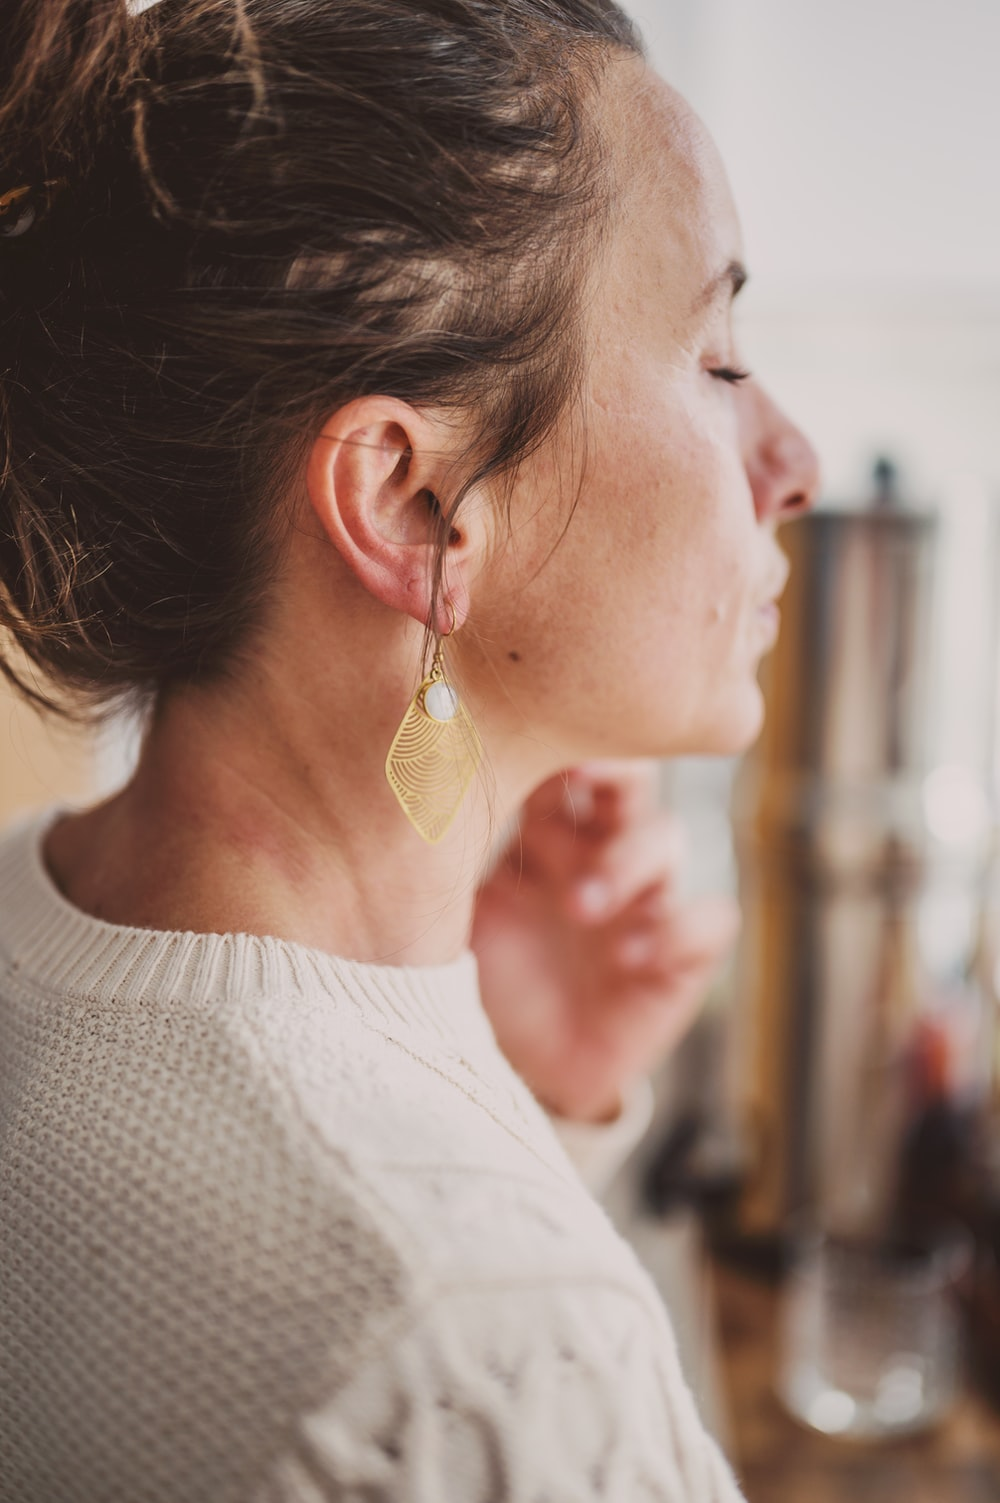 woman in white crew neck shirt wearing gold heart earring